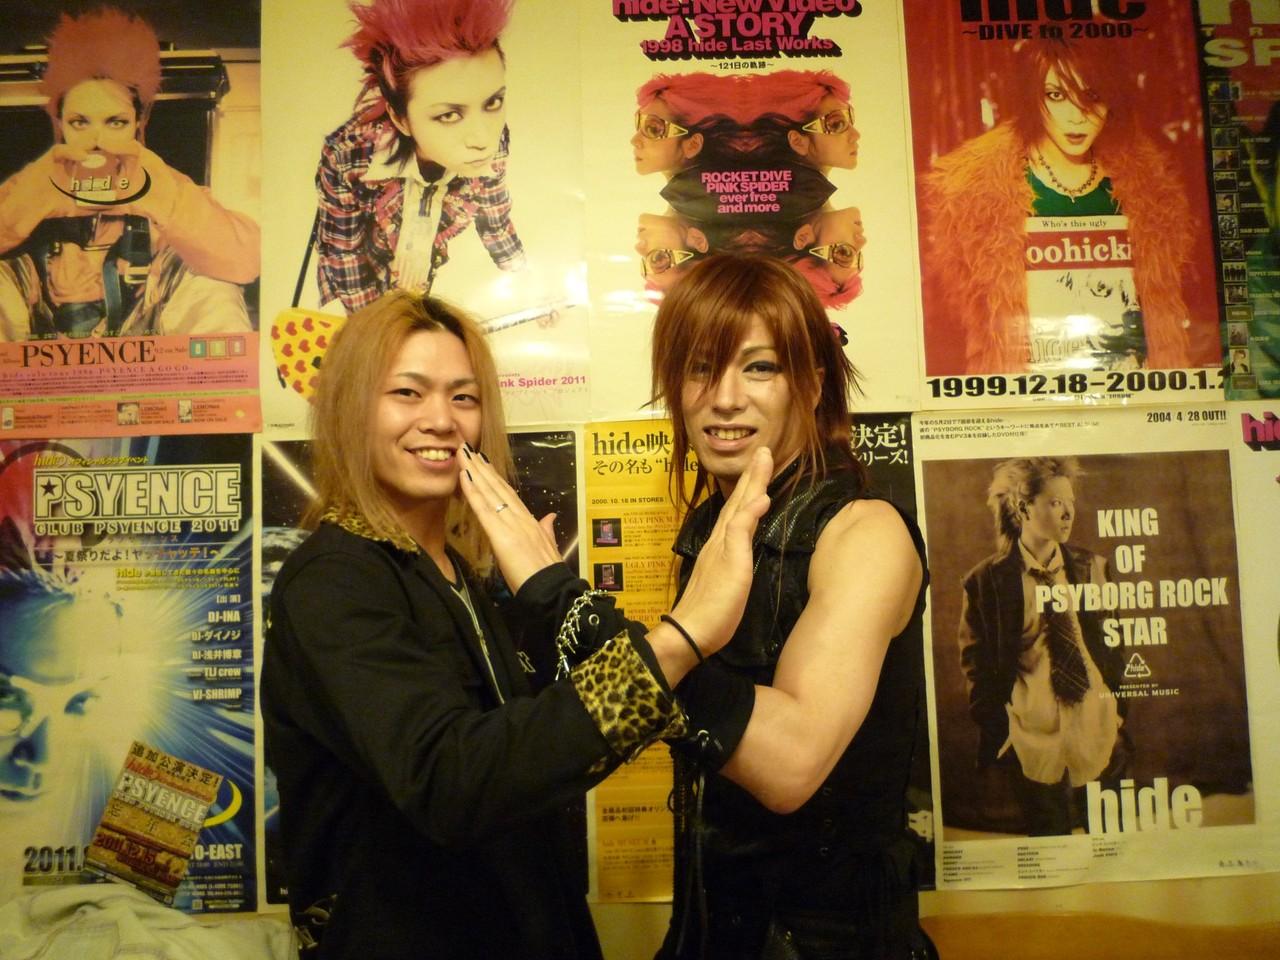 X-HIROSHIMAのYUSHIさんとX記念撮影☆僕が心から尊敬する熱いミュージシャンです!大切な音楽仲間です!